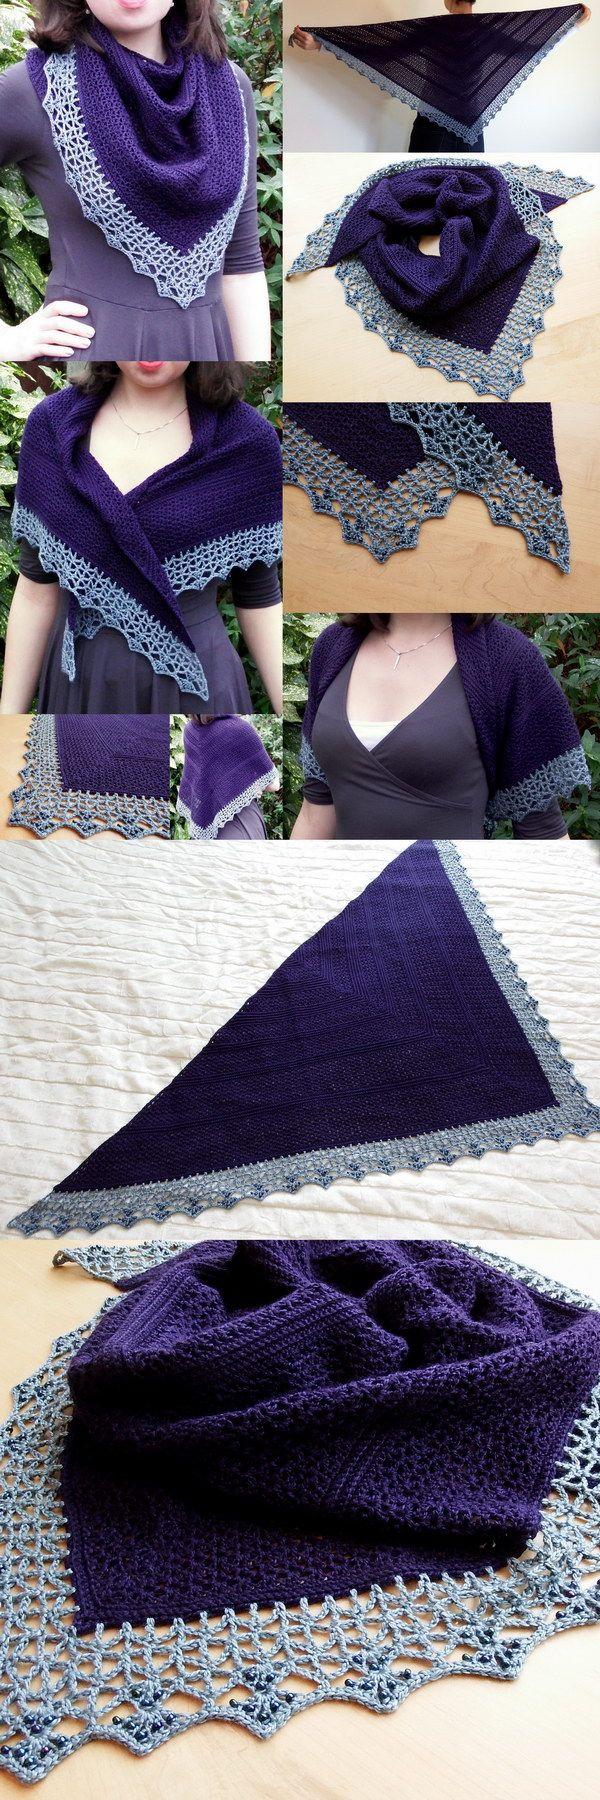 30 Great Crochet Shawl Patterns | Chal, Ponchos y Blusas lindas